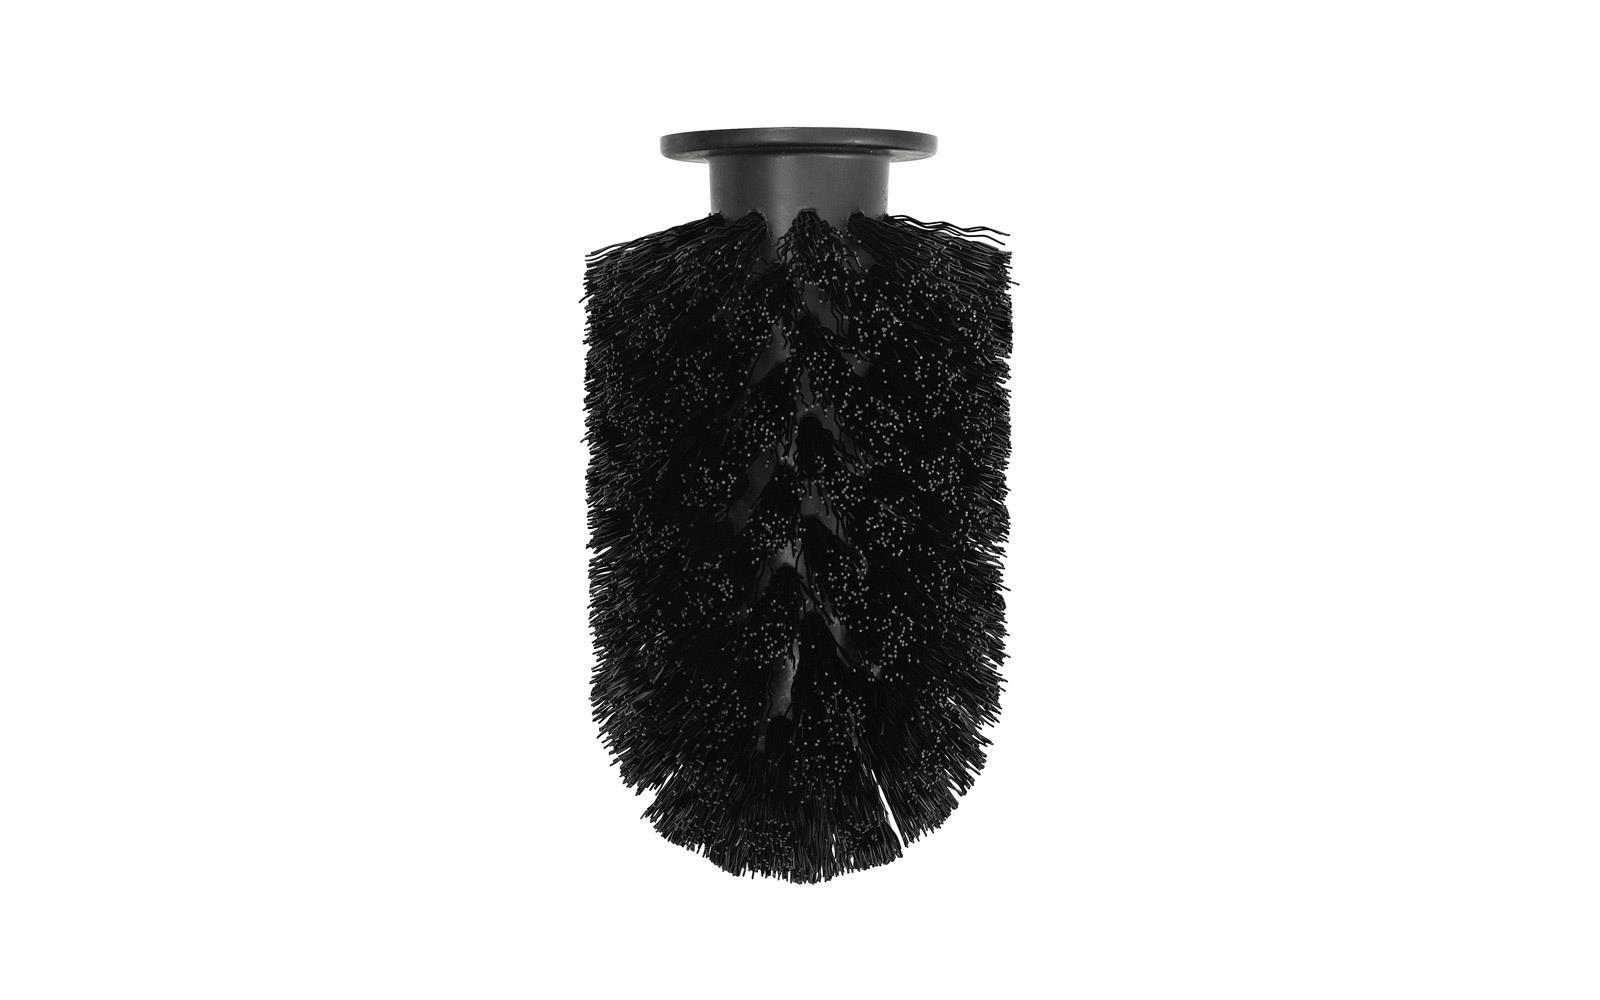 Toilet Brush Head : Ballo brush head in black replacement head for ballo toilet brush